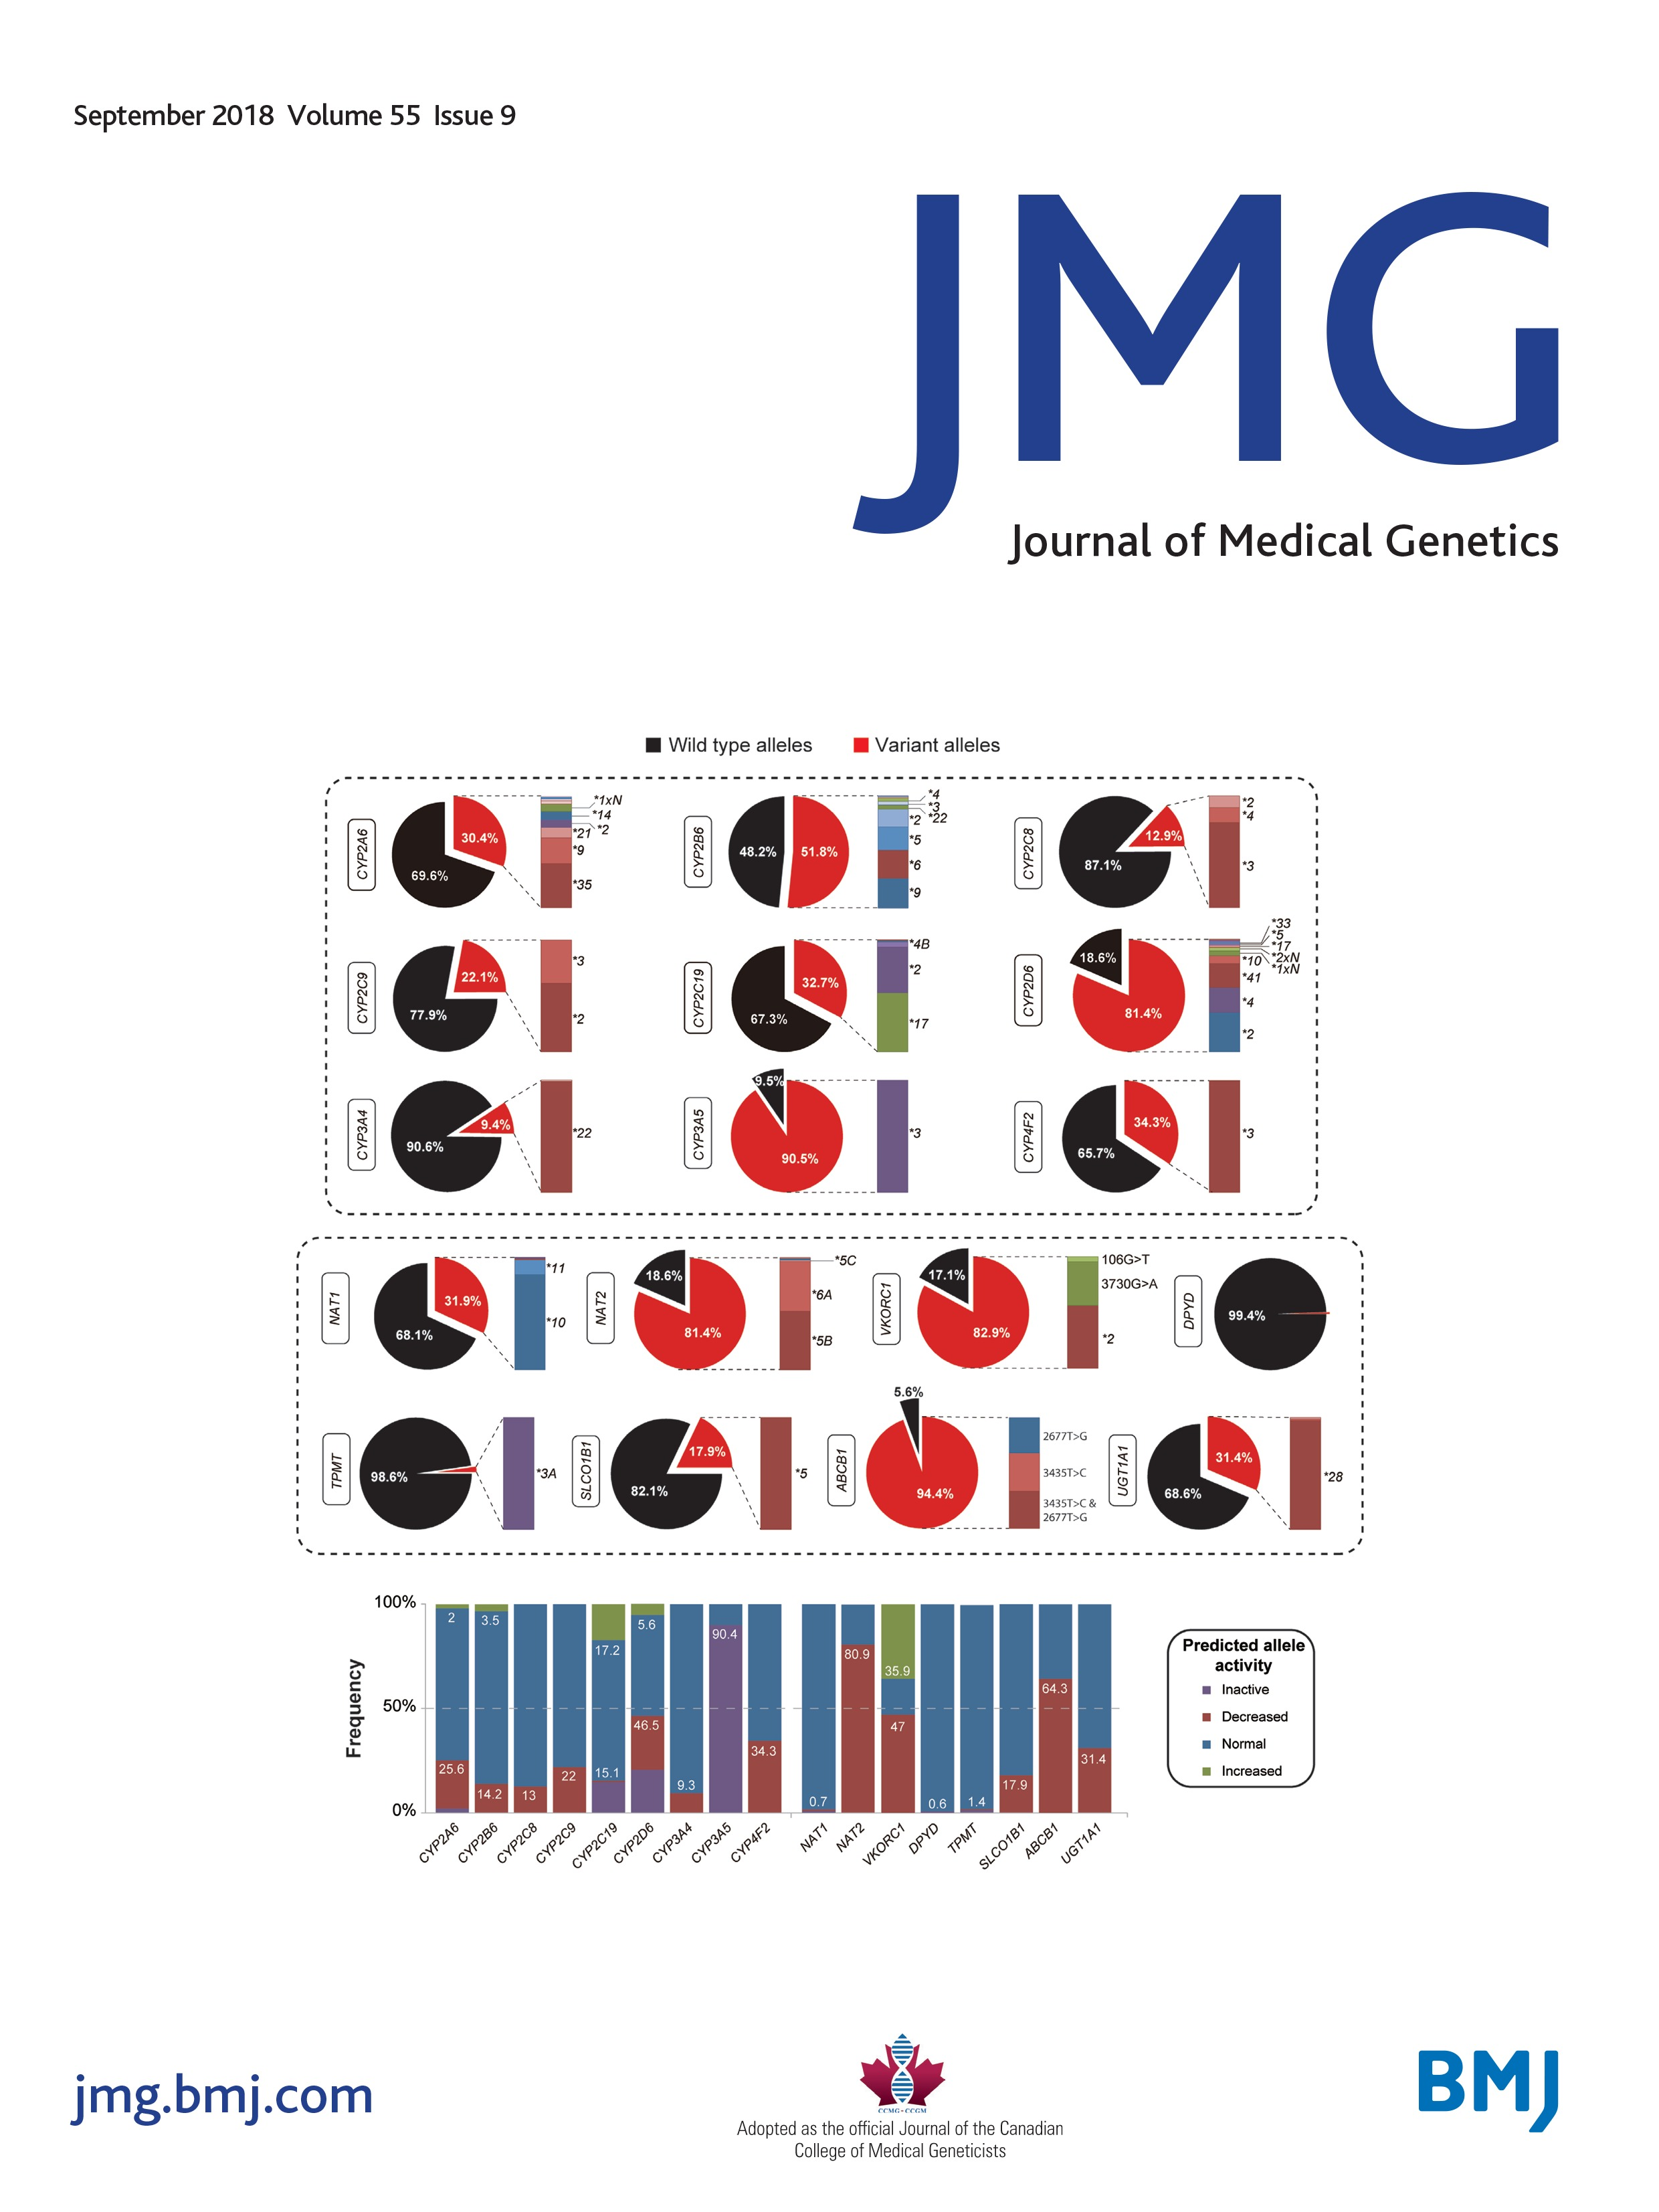 Evolution of genetic assessment for BRCA-associated gynaecologic